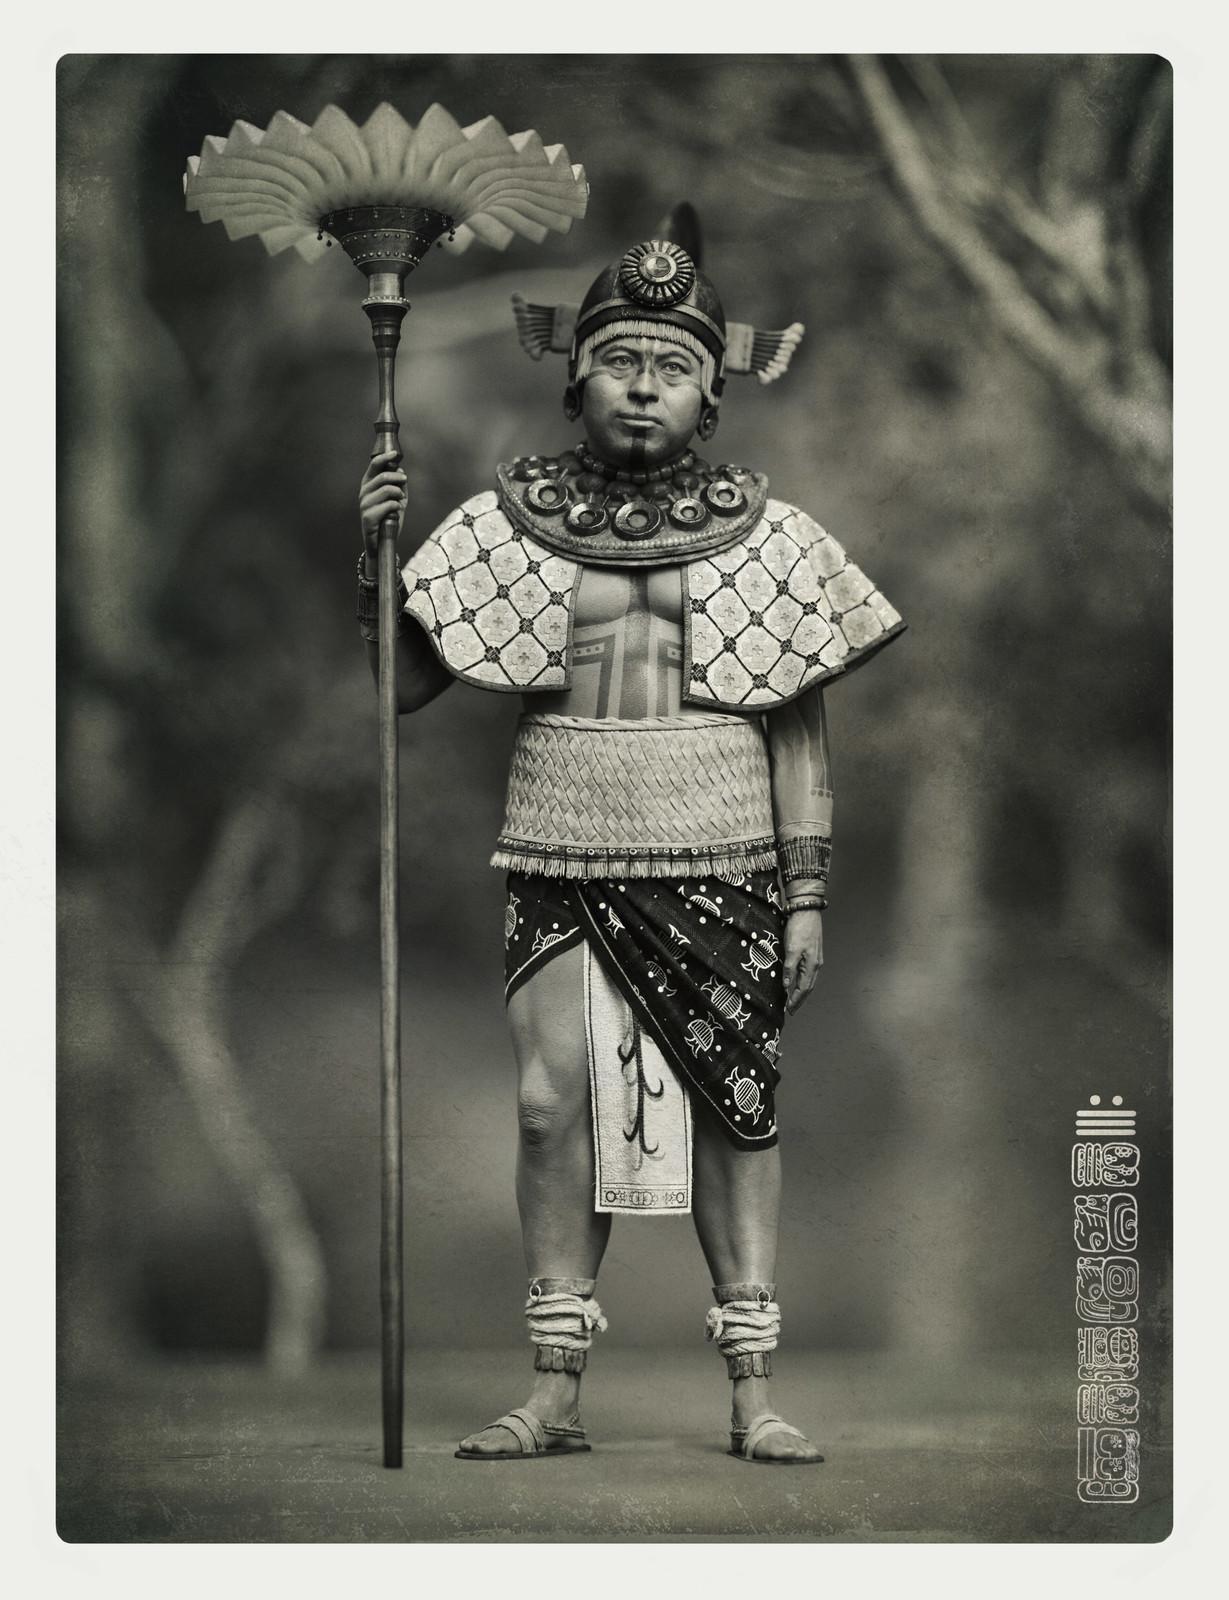 Mayan merchant